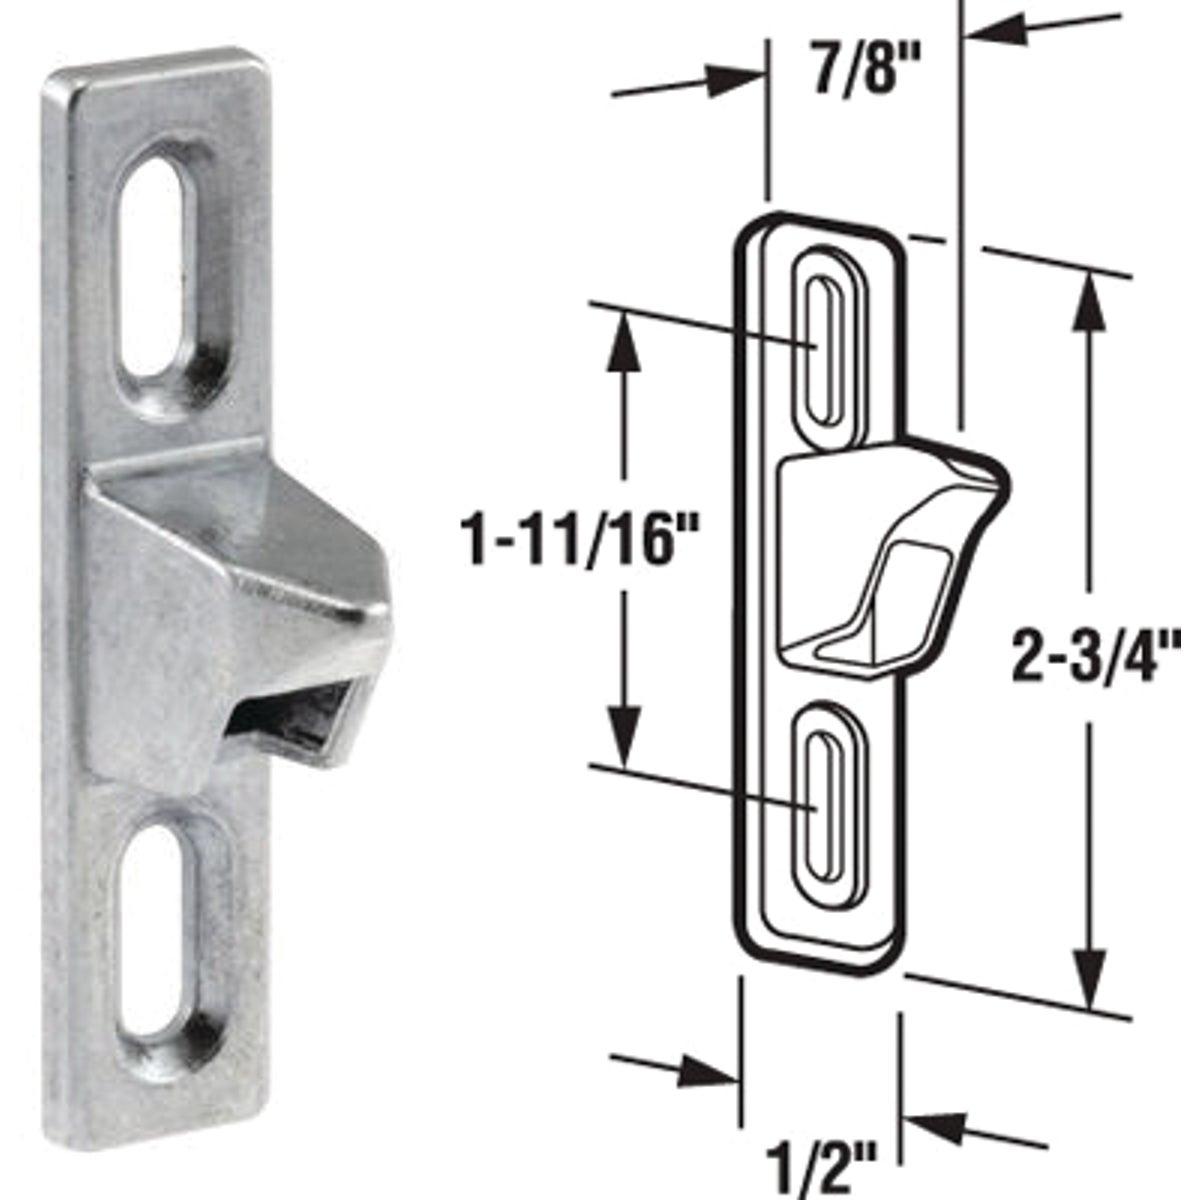 PATIO DOOR STRIKER - 14504 by Prime Line Products